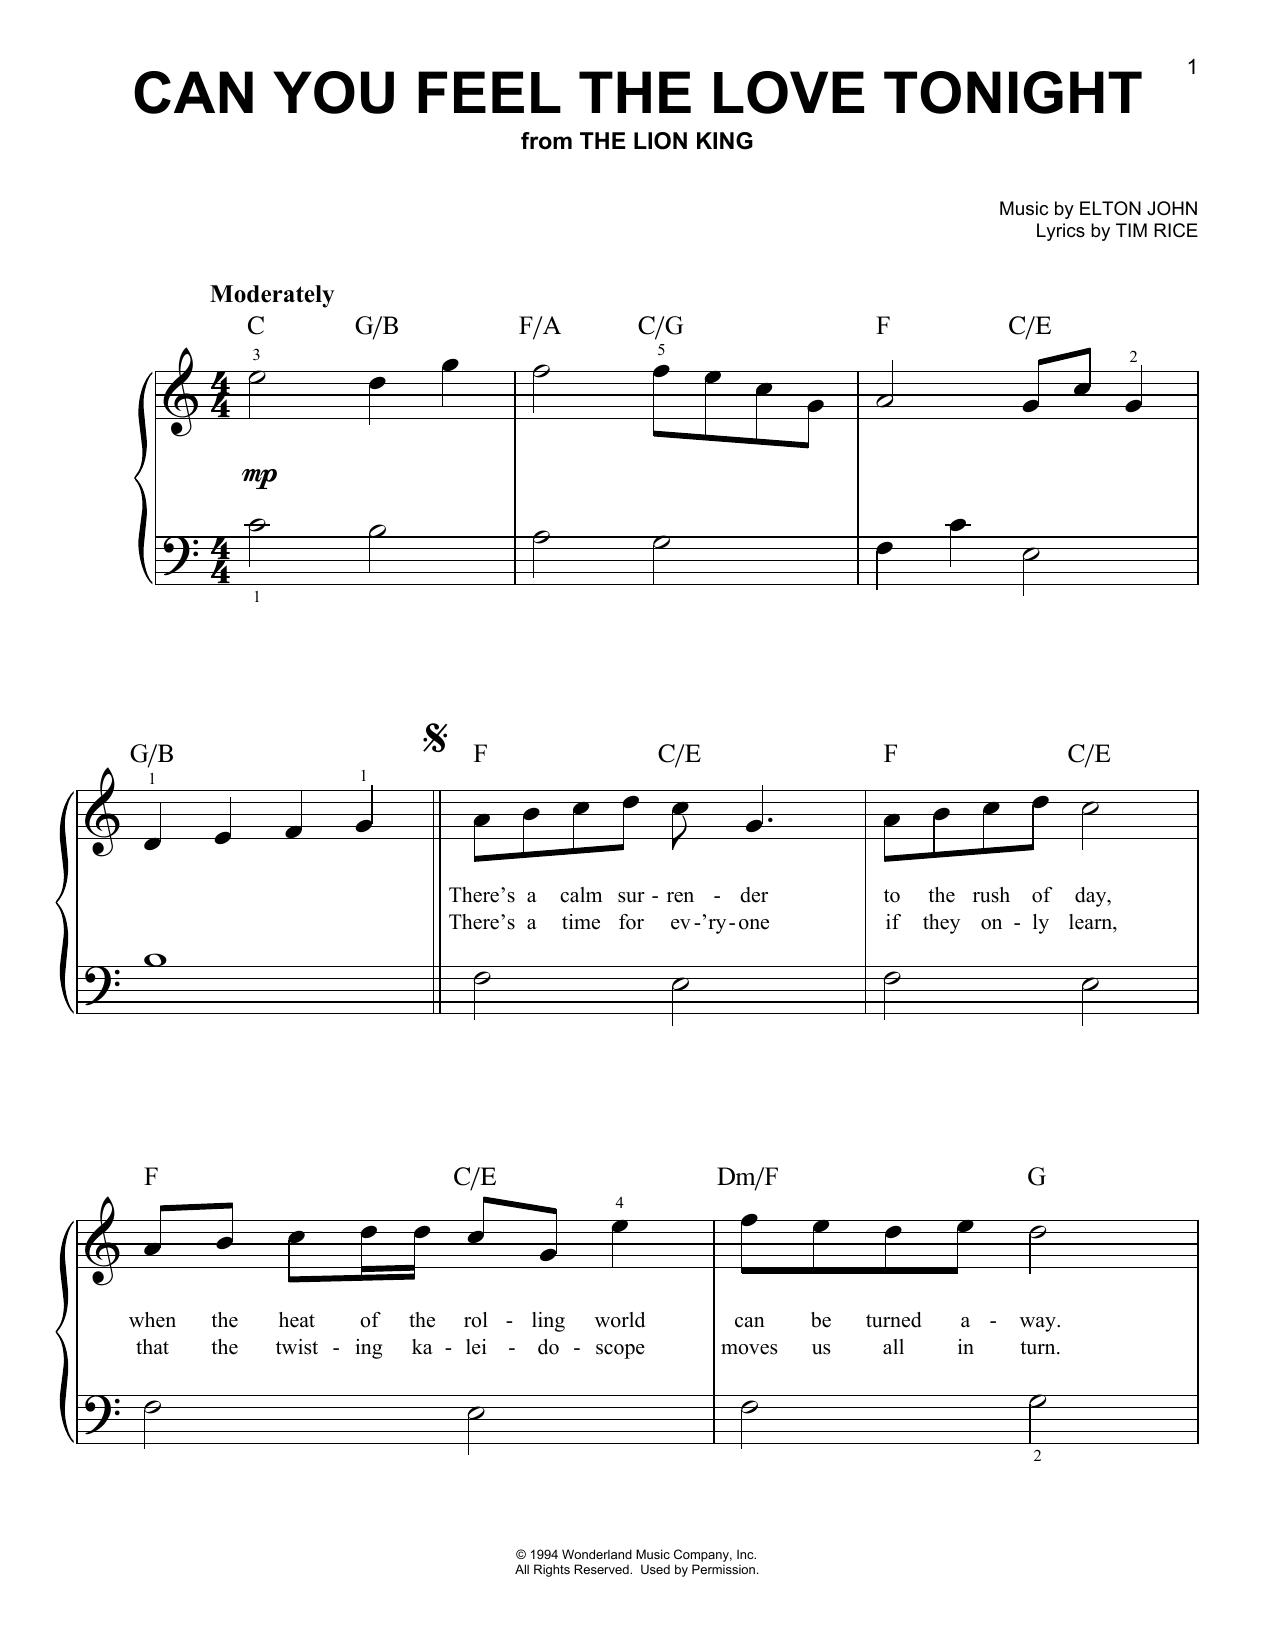 Sheet Music Digital Files To Print - Licensed Tim Rice